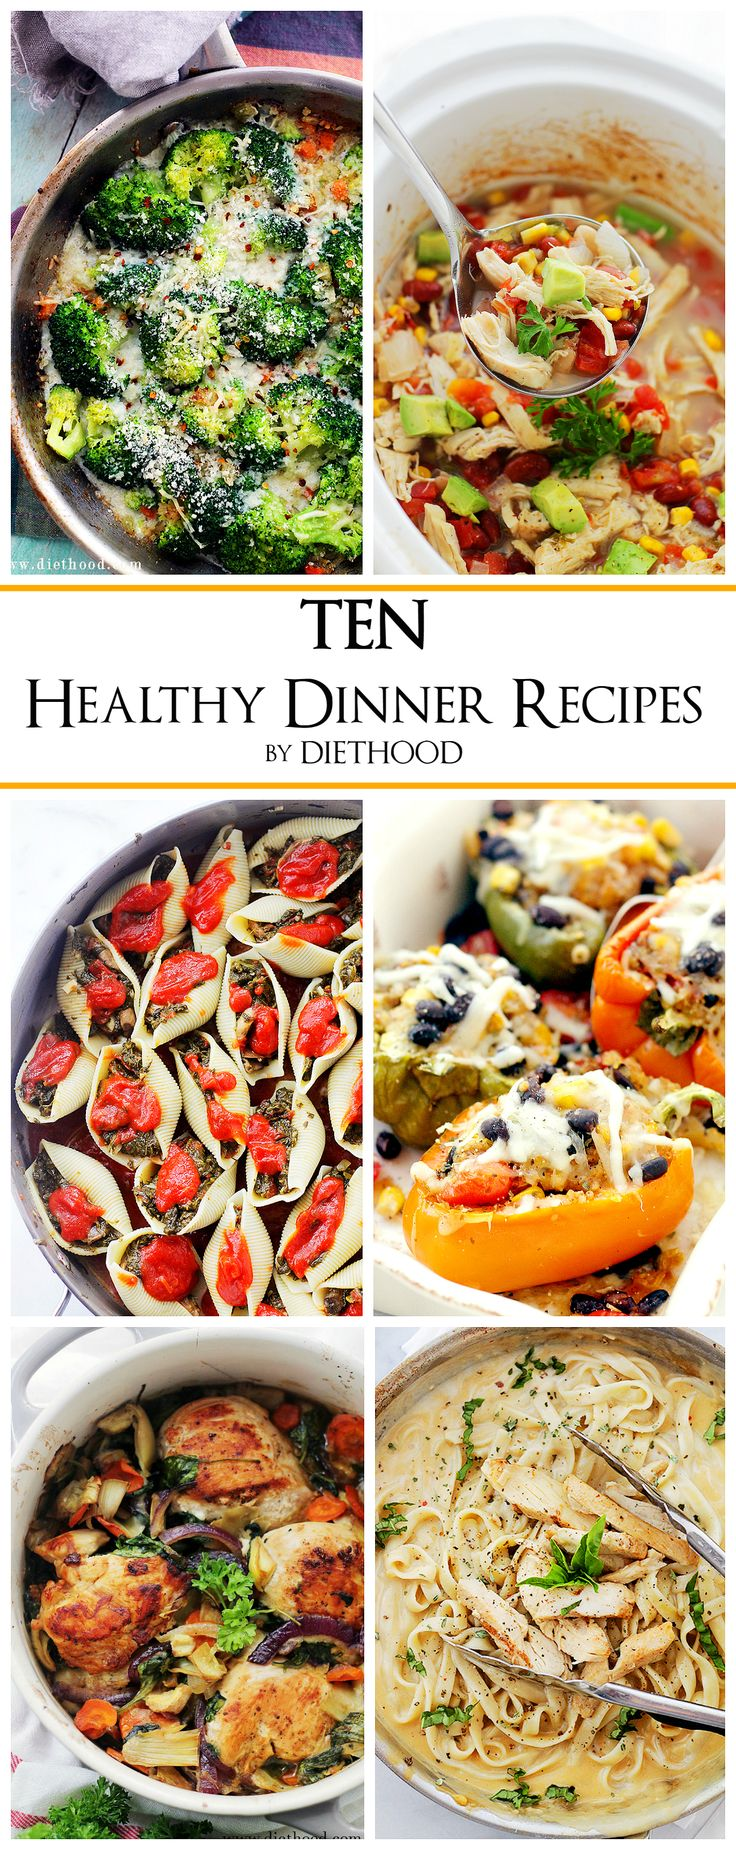 TEN Healthy Easy Dinner Recipes + Kale & Feta One-Pot Pasta | www.diethood.com